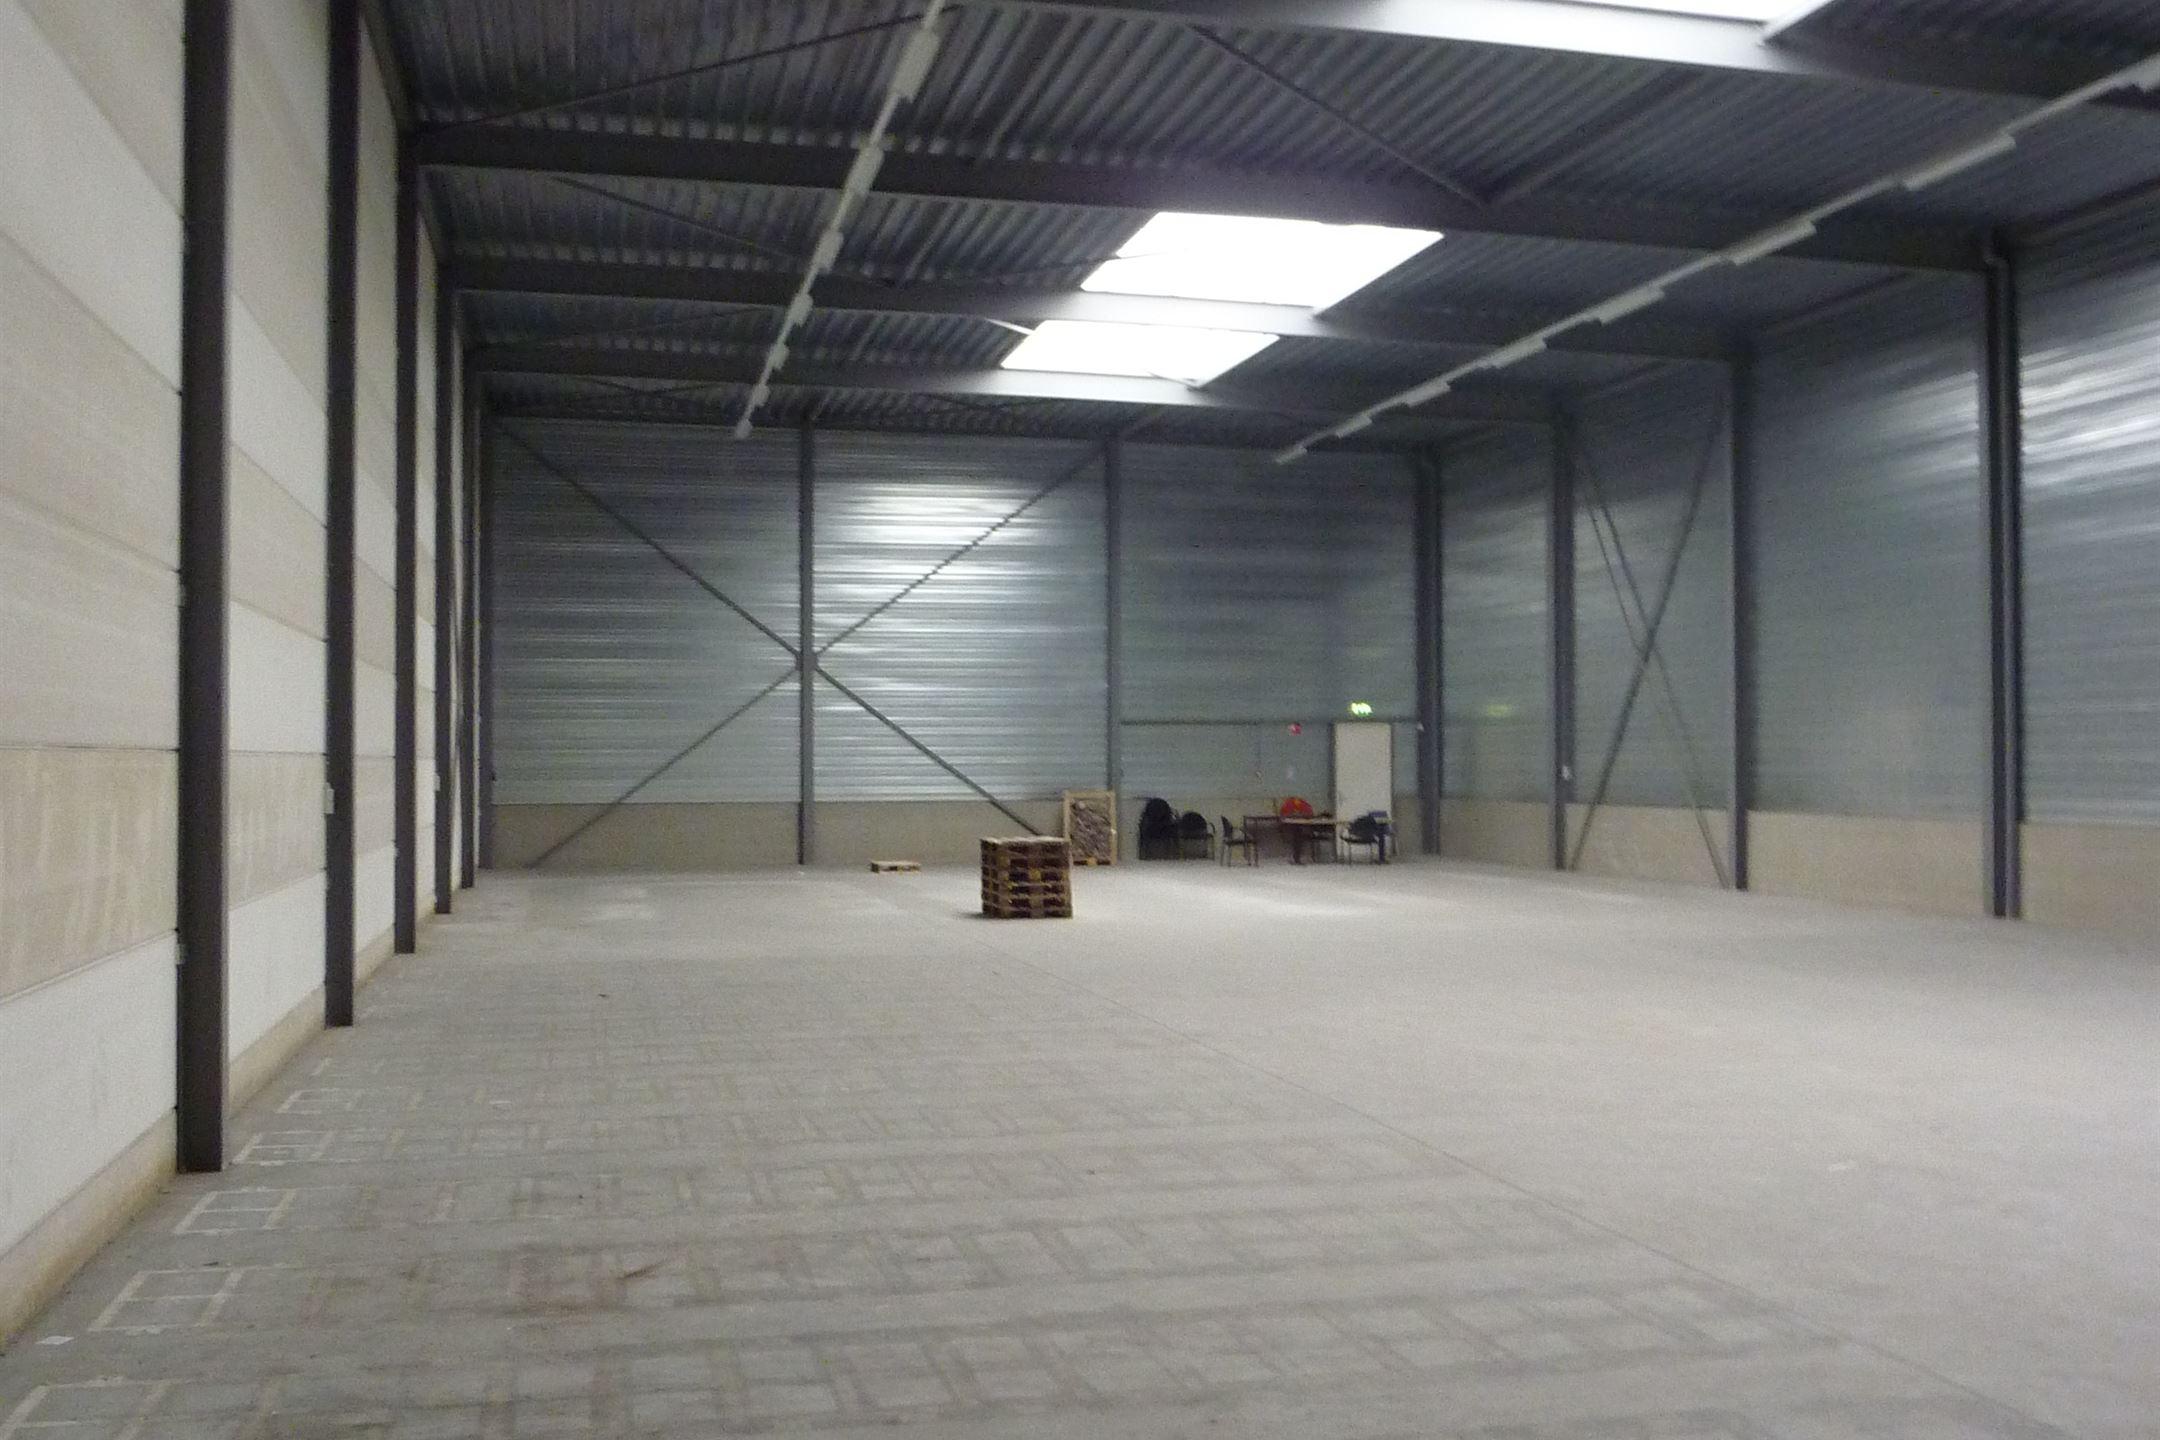 Eindhoven zoek verkocht: ruysdaelbaan 3 01 5642 jj eindhoven